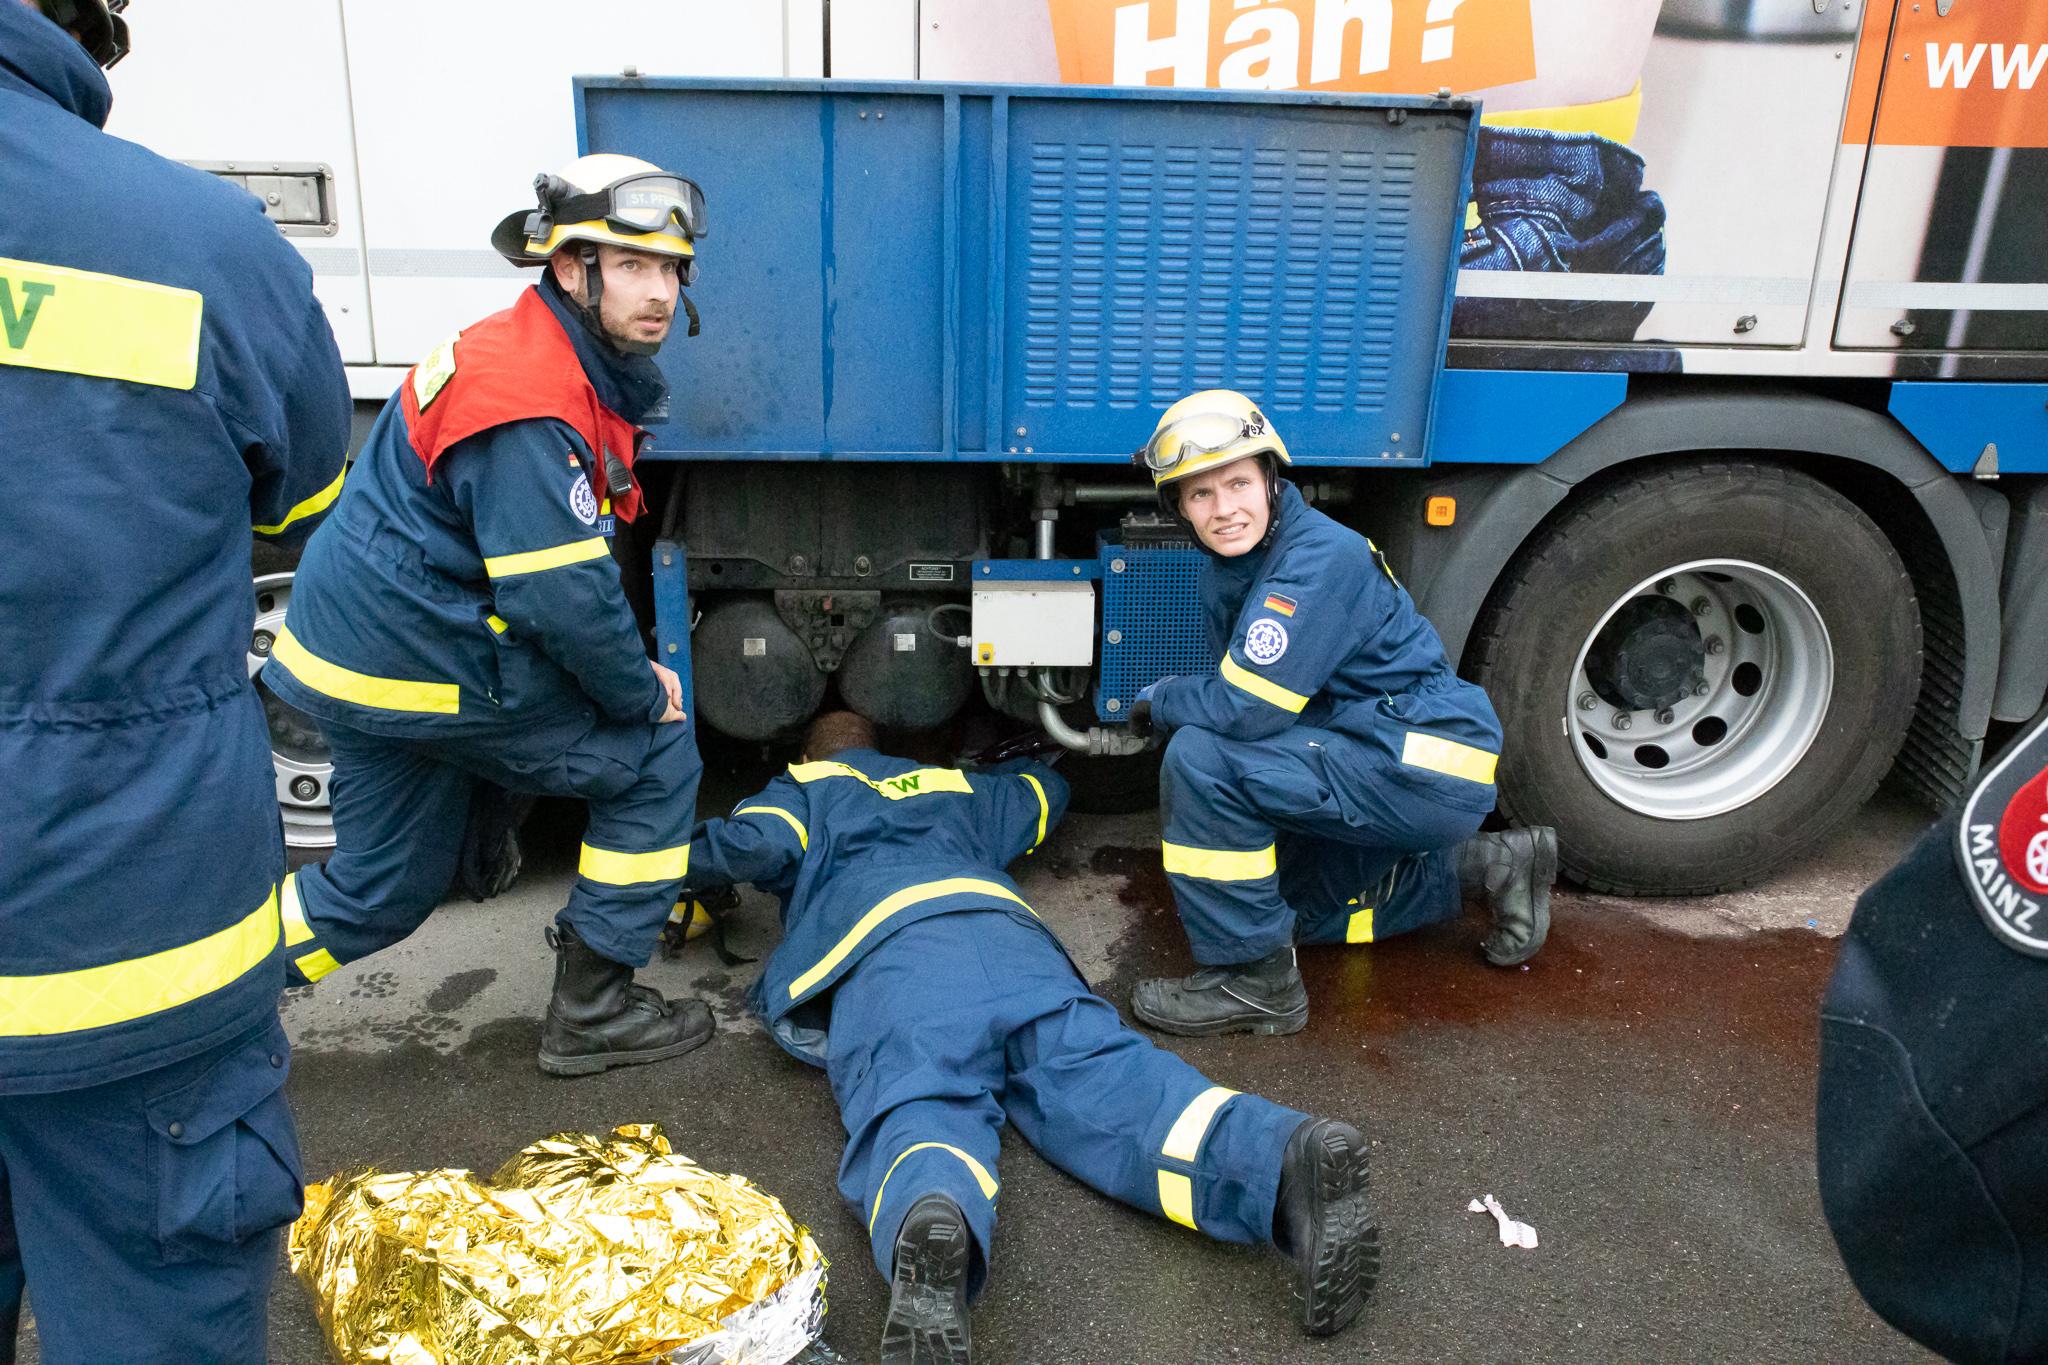 FeuerwehrSim 2019 Henckackerweg-12